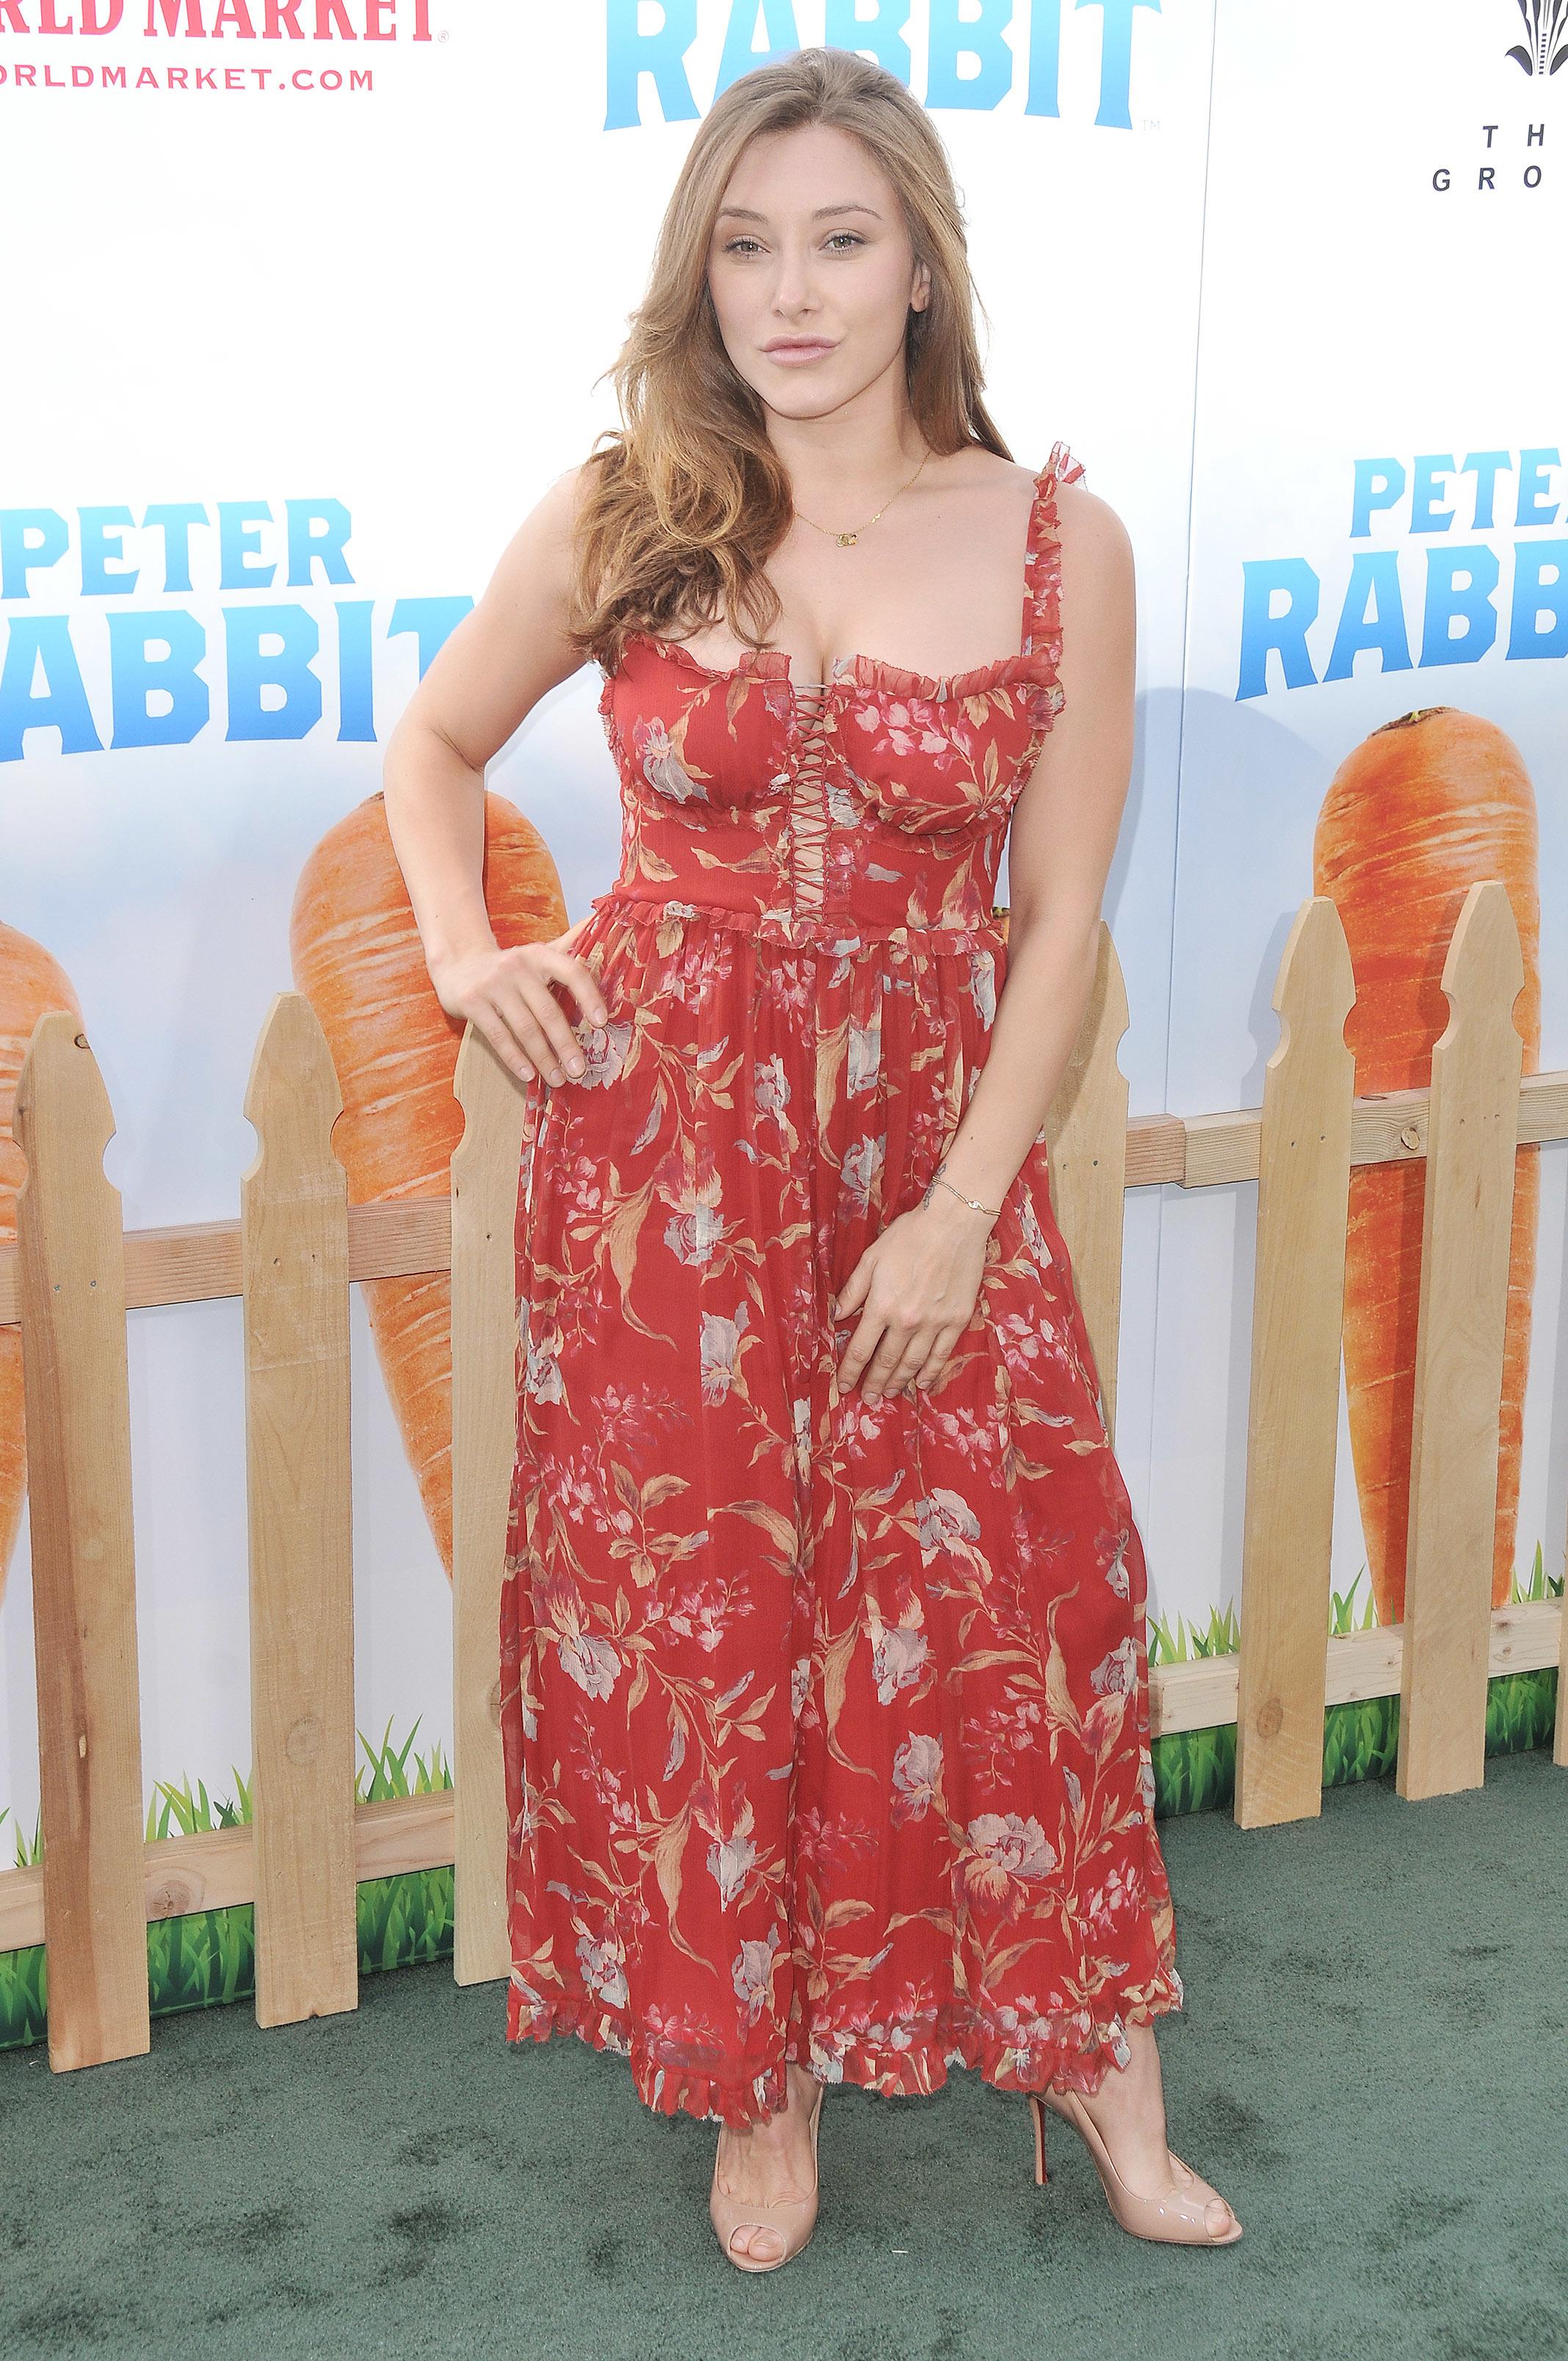 Heather-Elizabeth Parkhurst